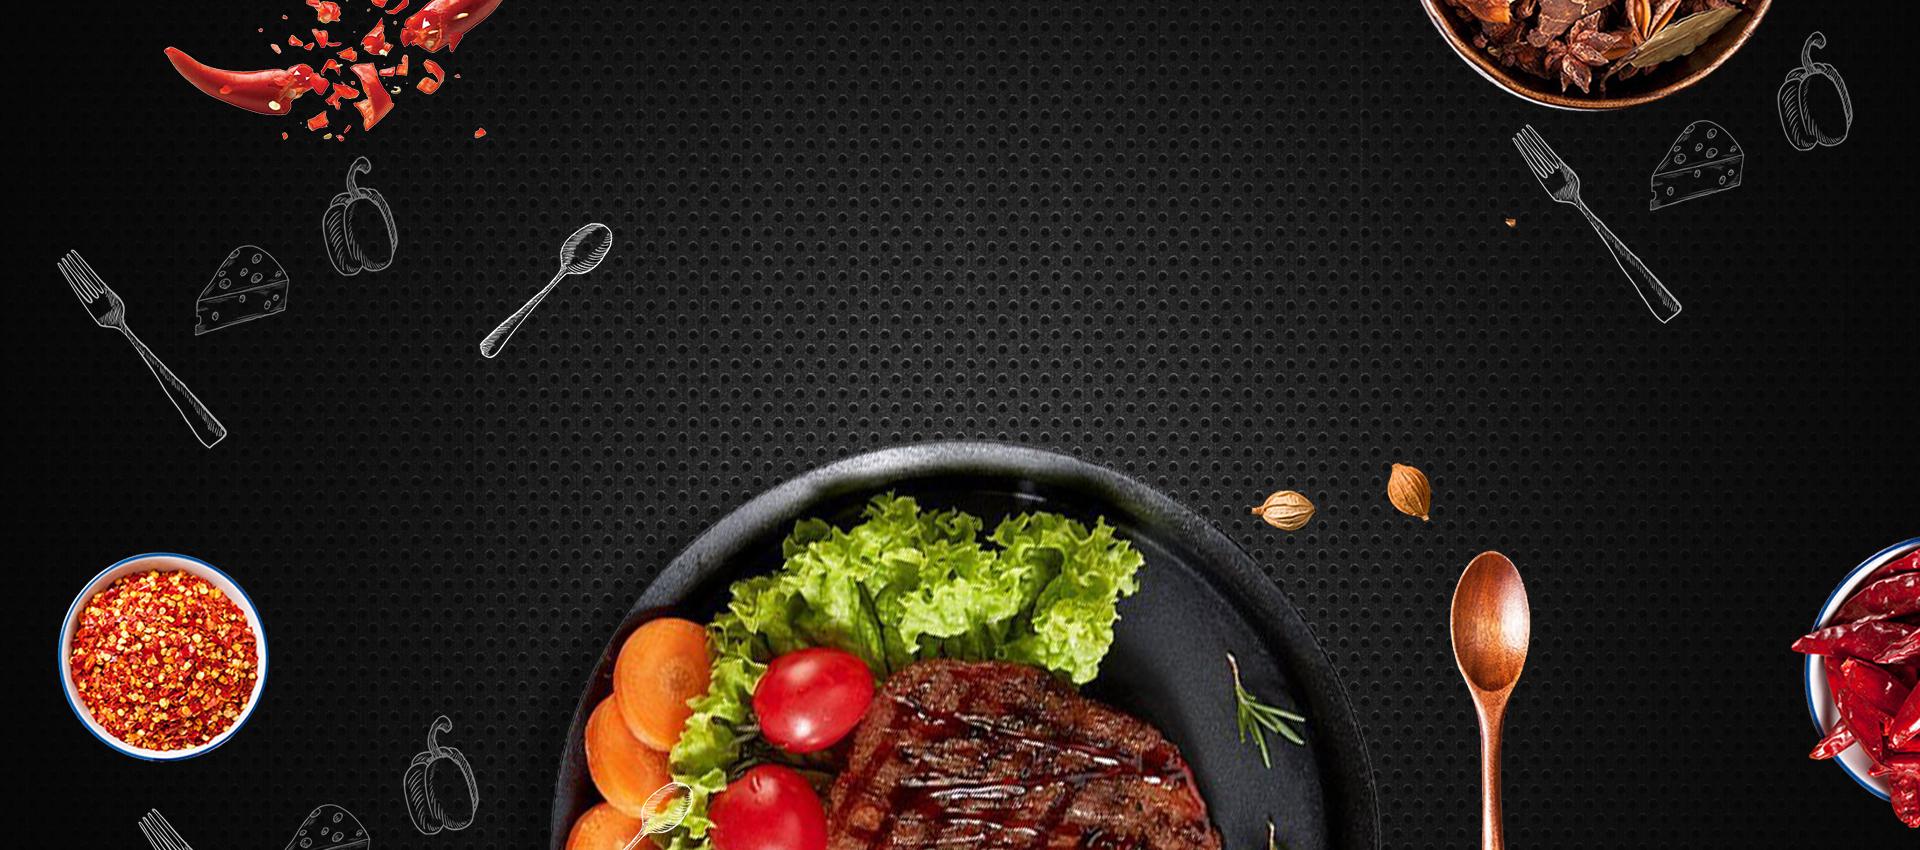 Late Night Snack Gourmet Wine Steak Promotion Cool